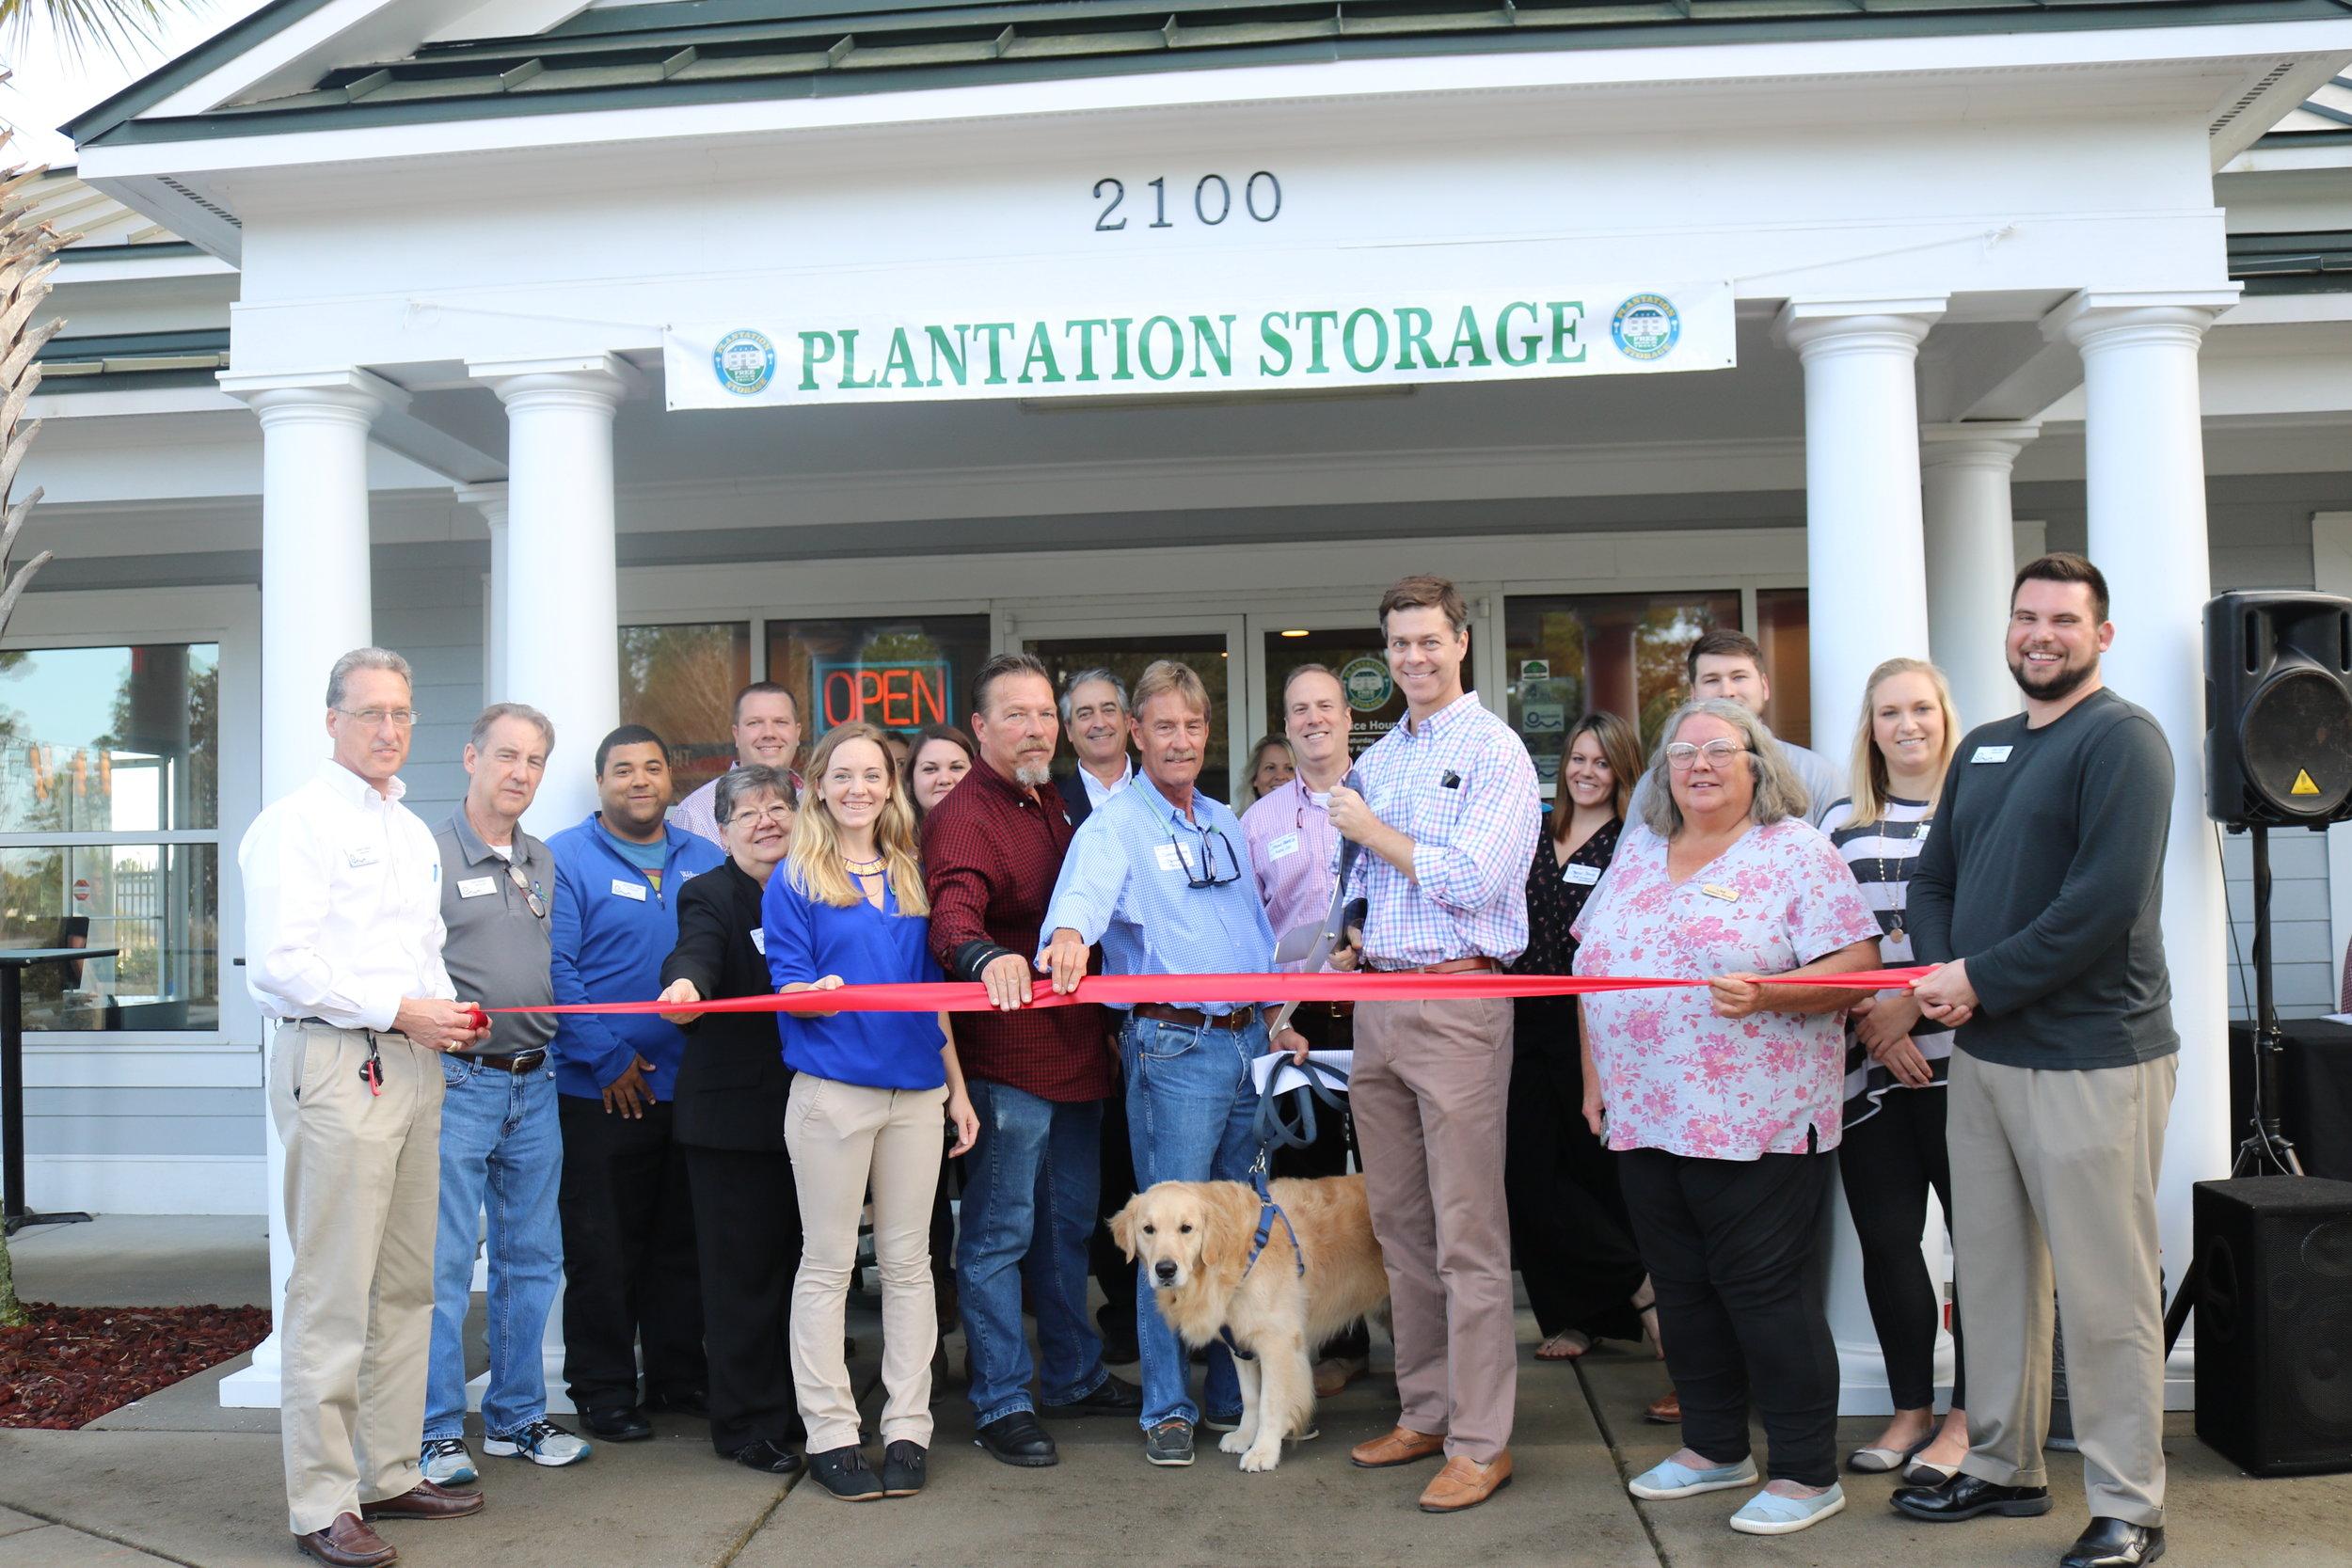 Plantation Storage.JPG